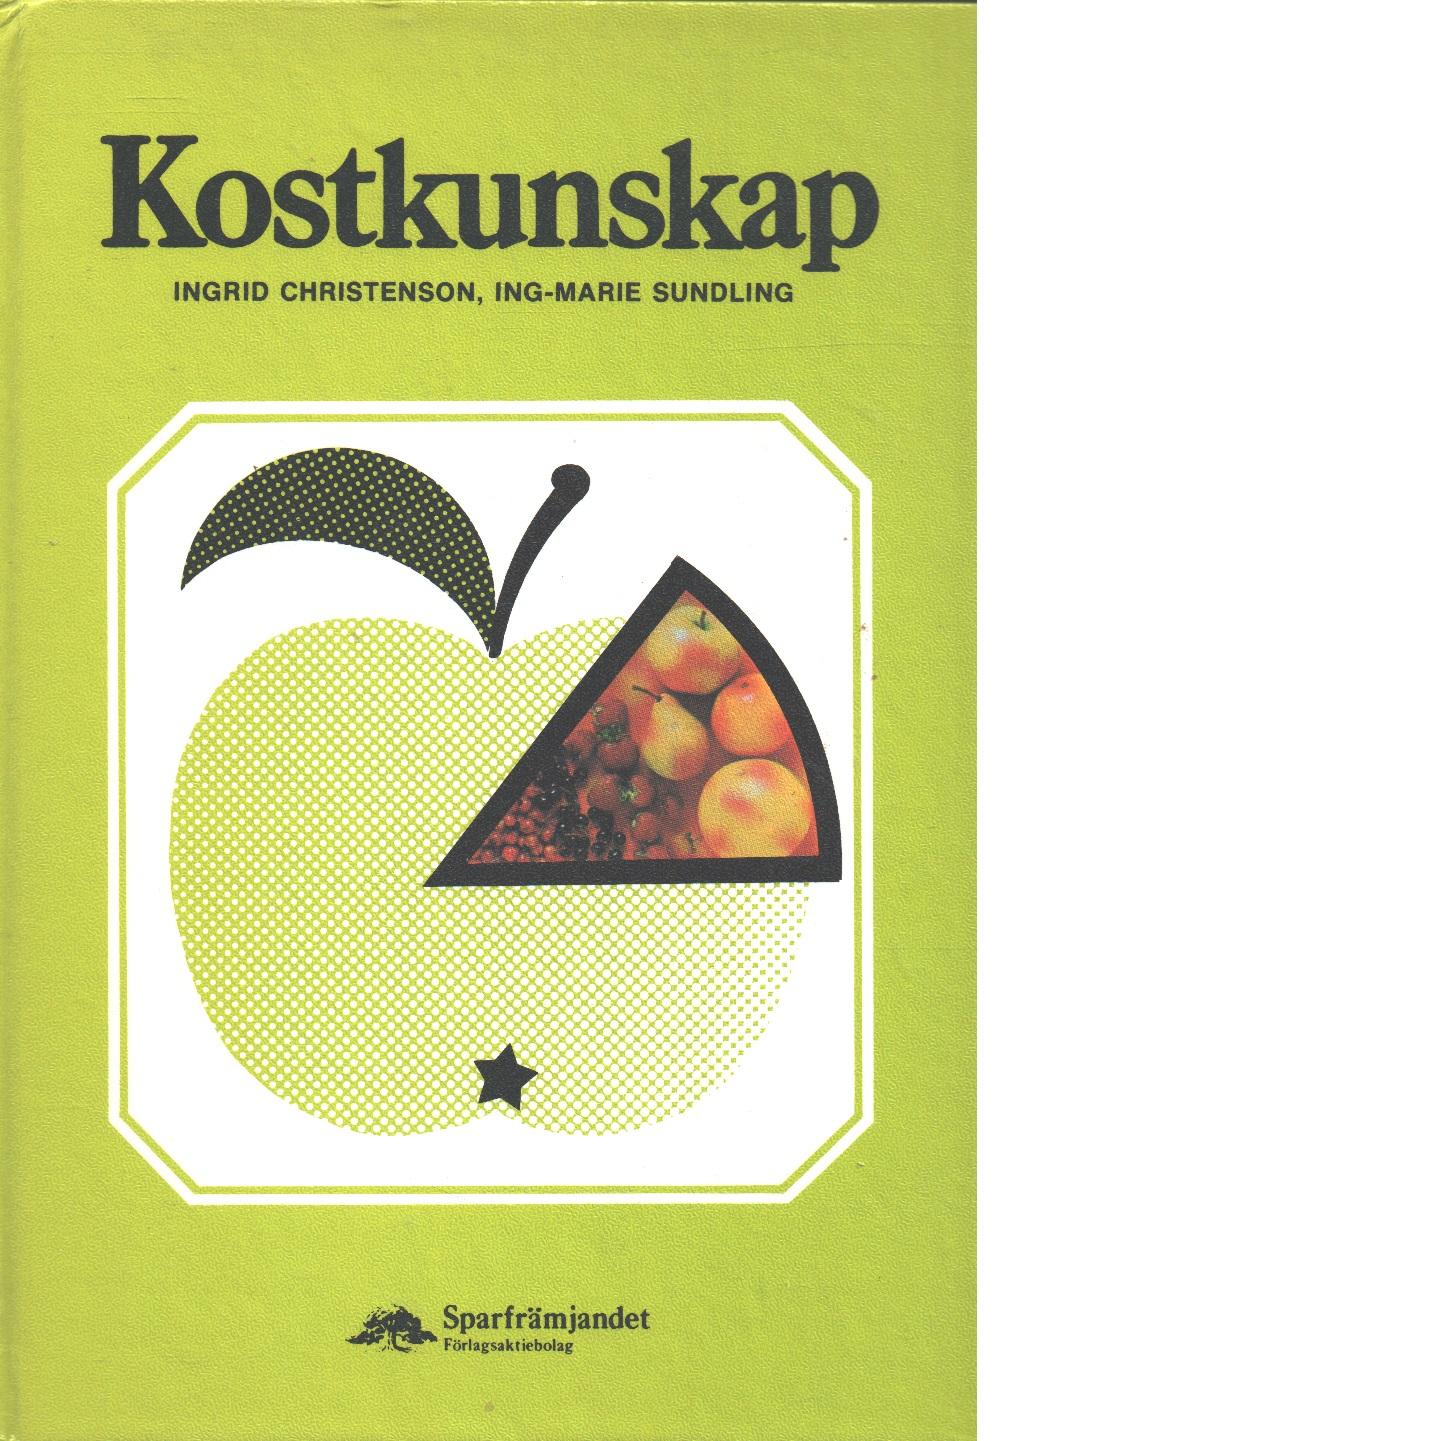 Kostkunskap - Christenson, Ingrid och Sundling, Ing-Marie